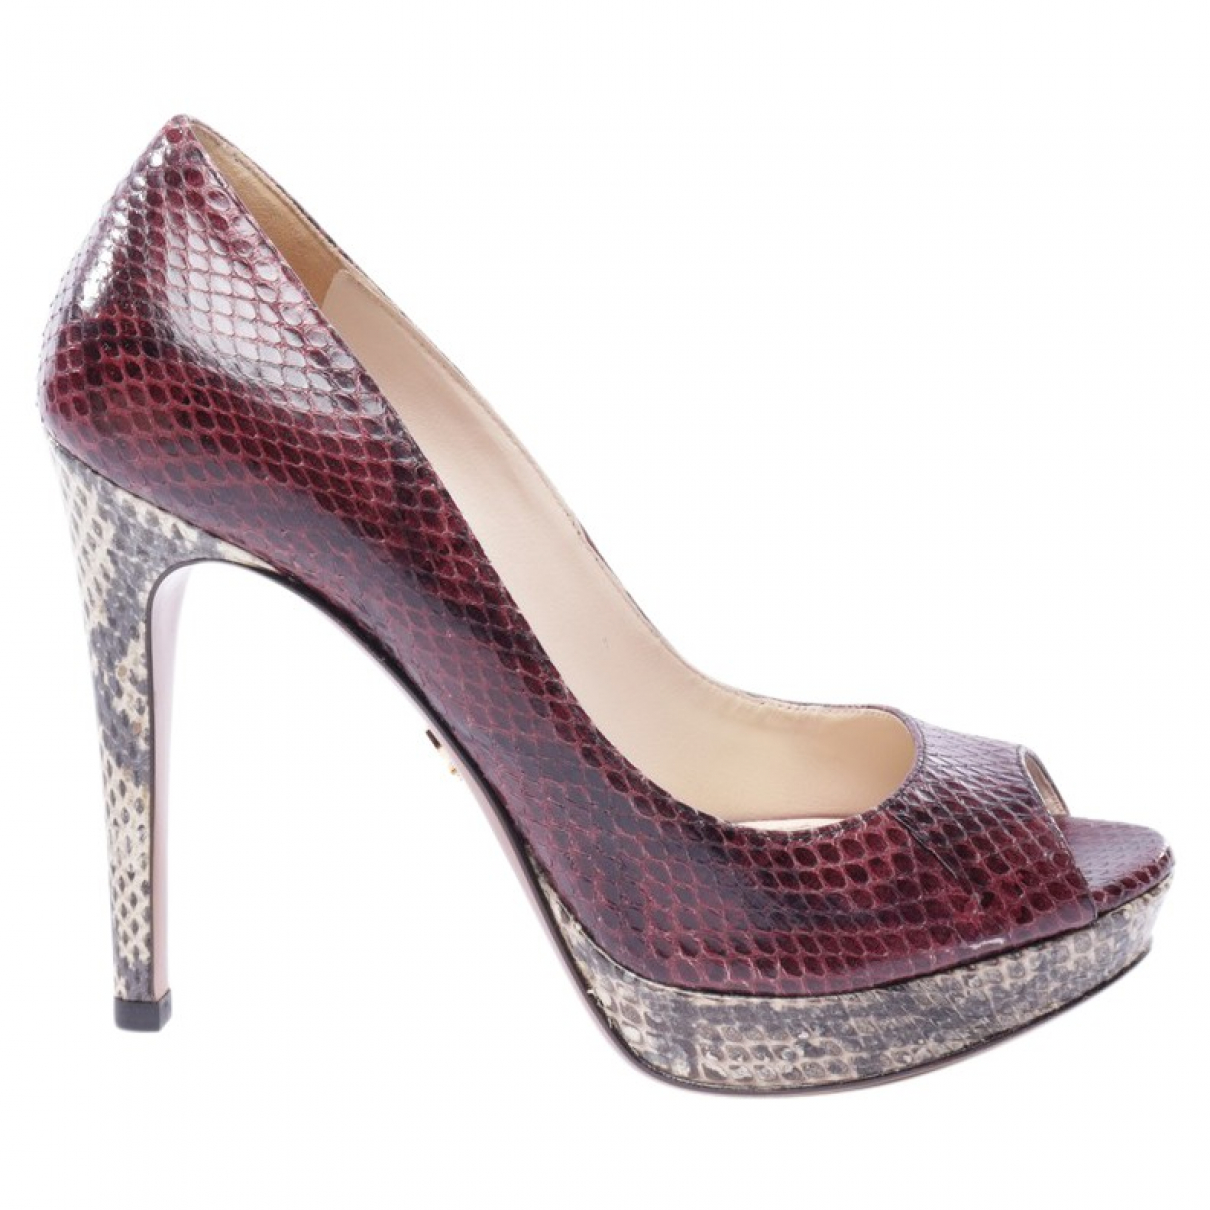 Prada \N Multicolour Leather Heels for Women 36.5 EU